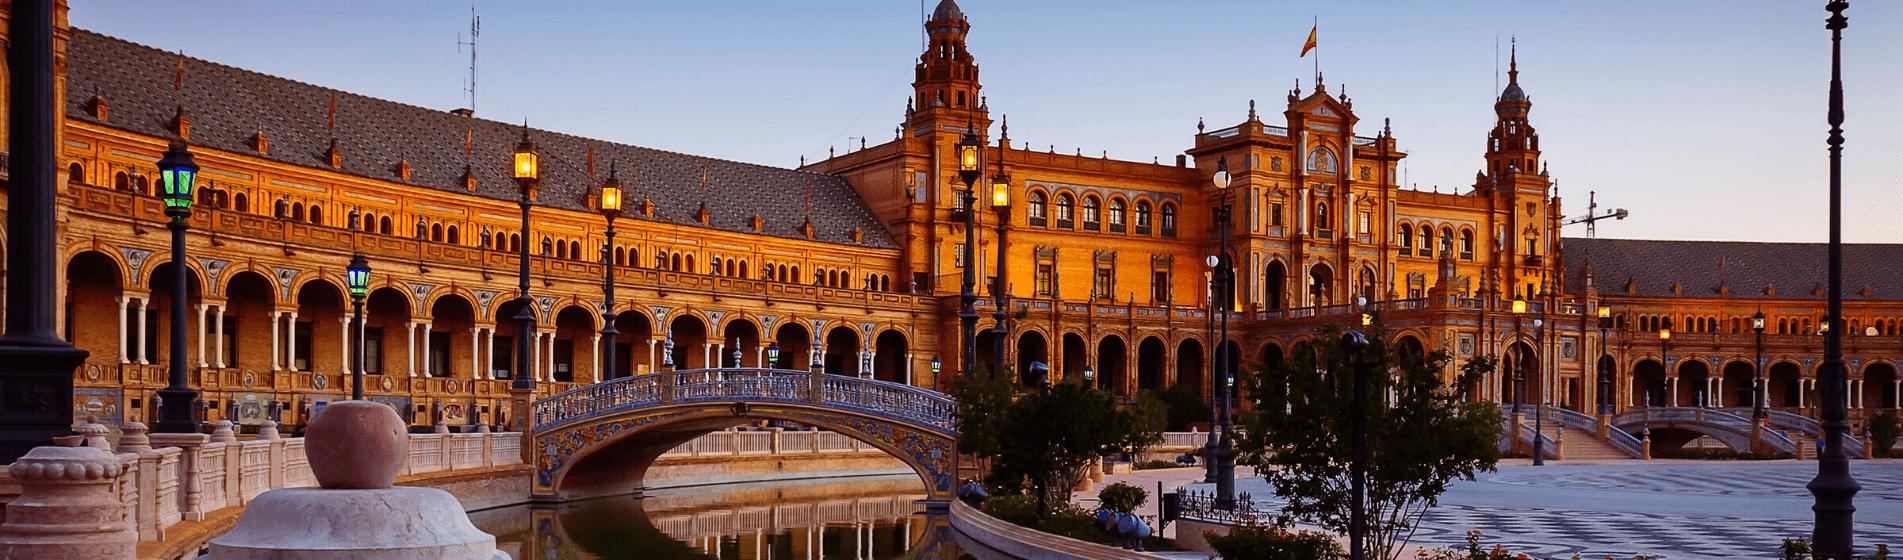 Why the Spanish entrepreneur visa may be a bad idea